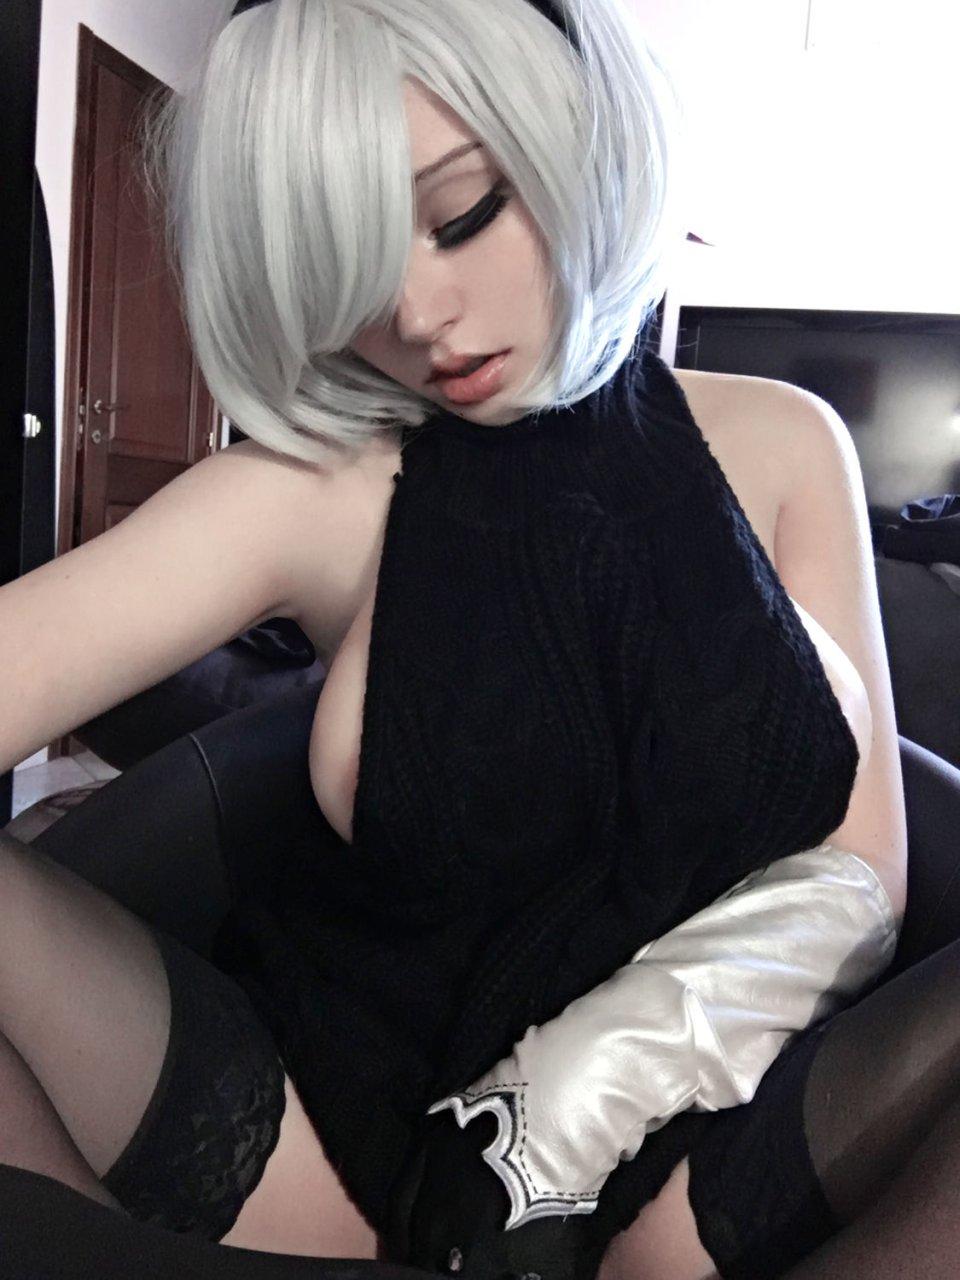 Girl caught stripping